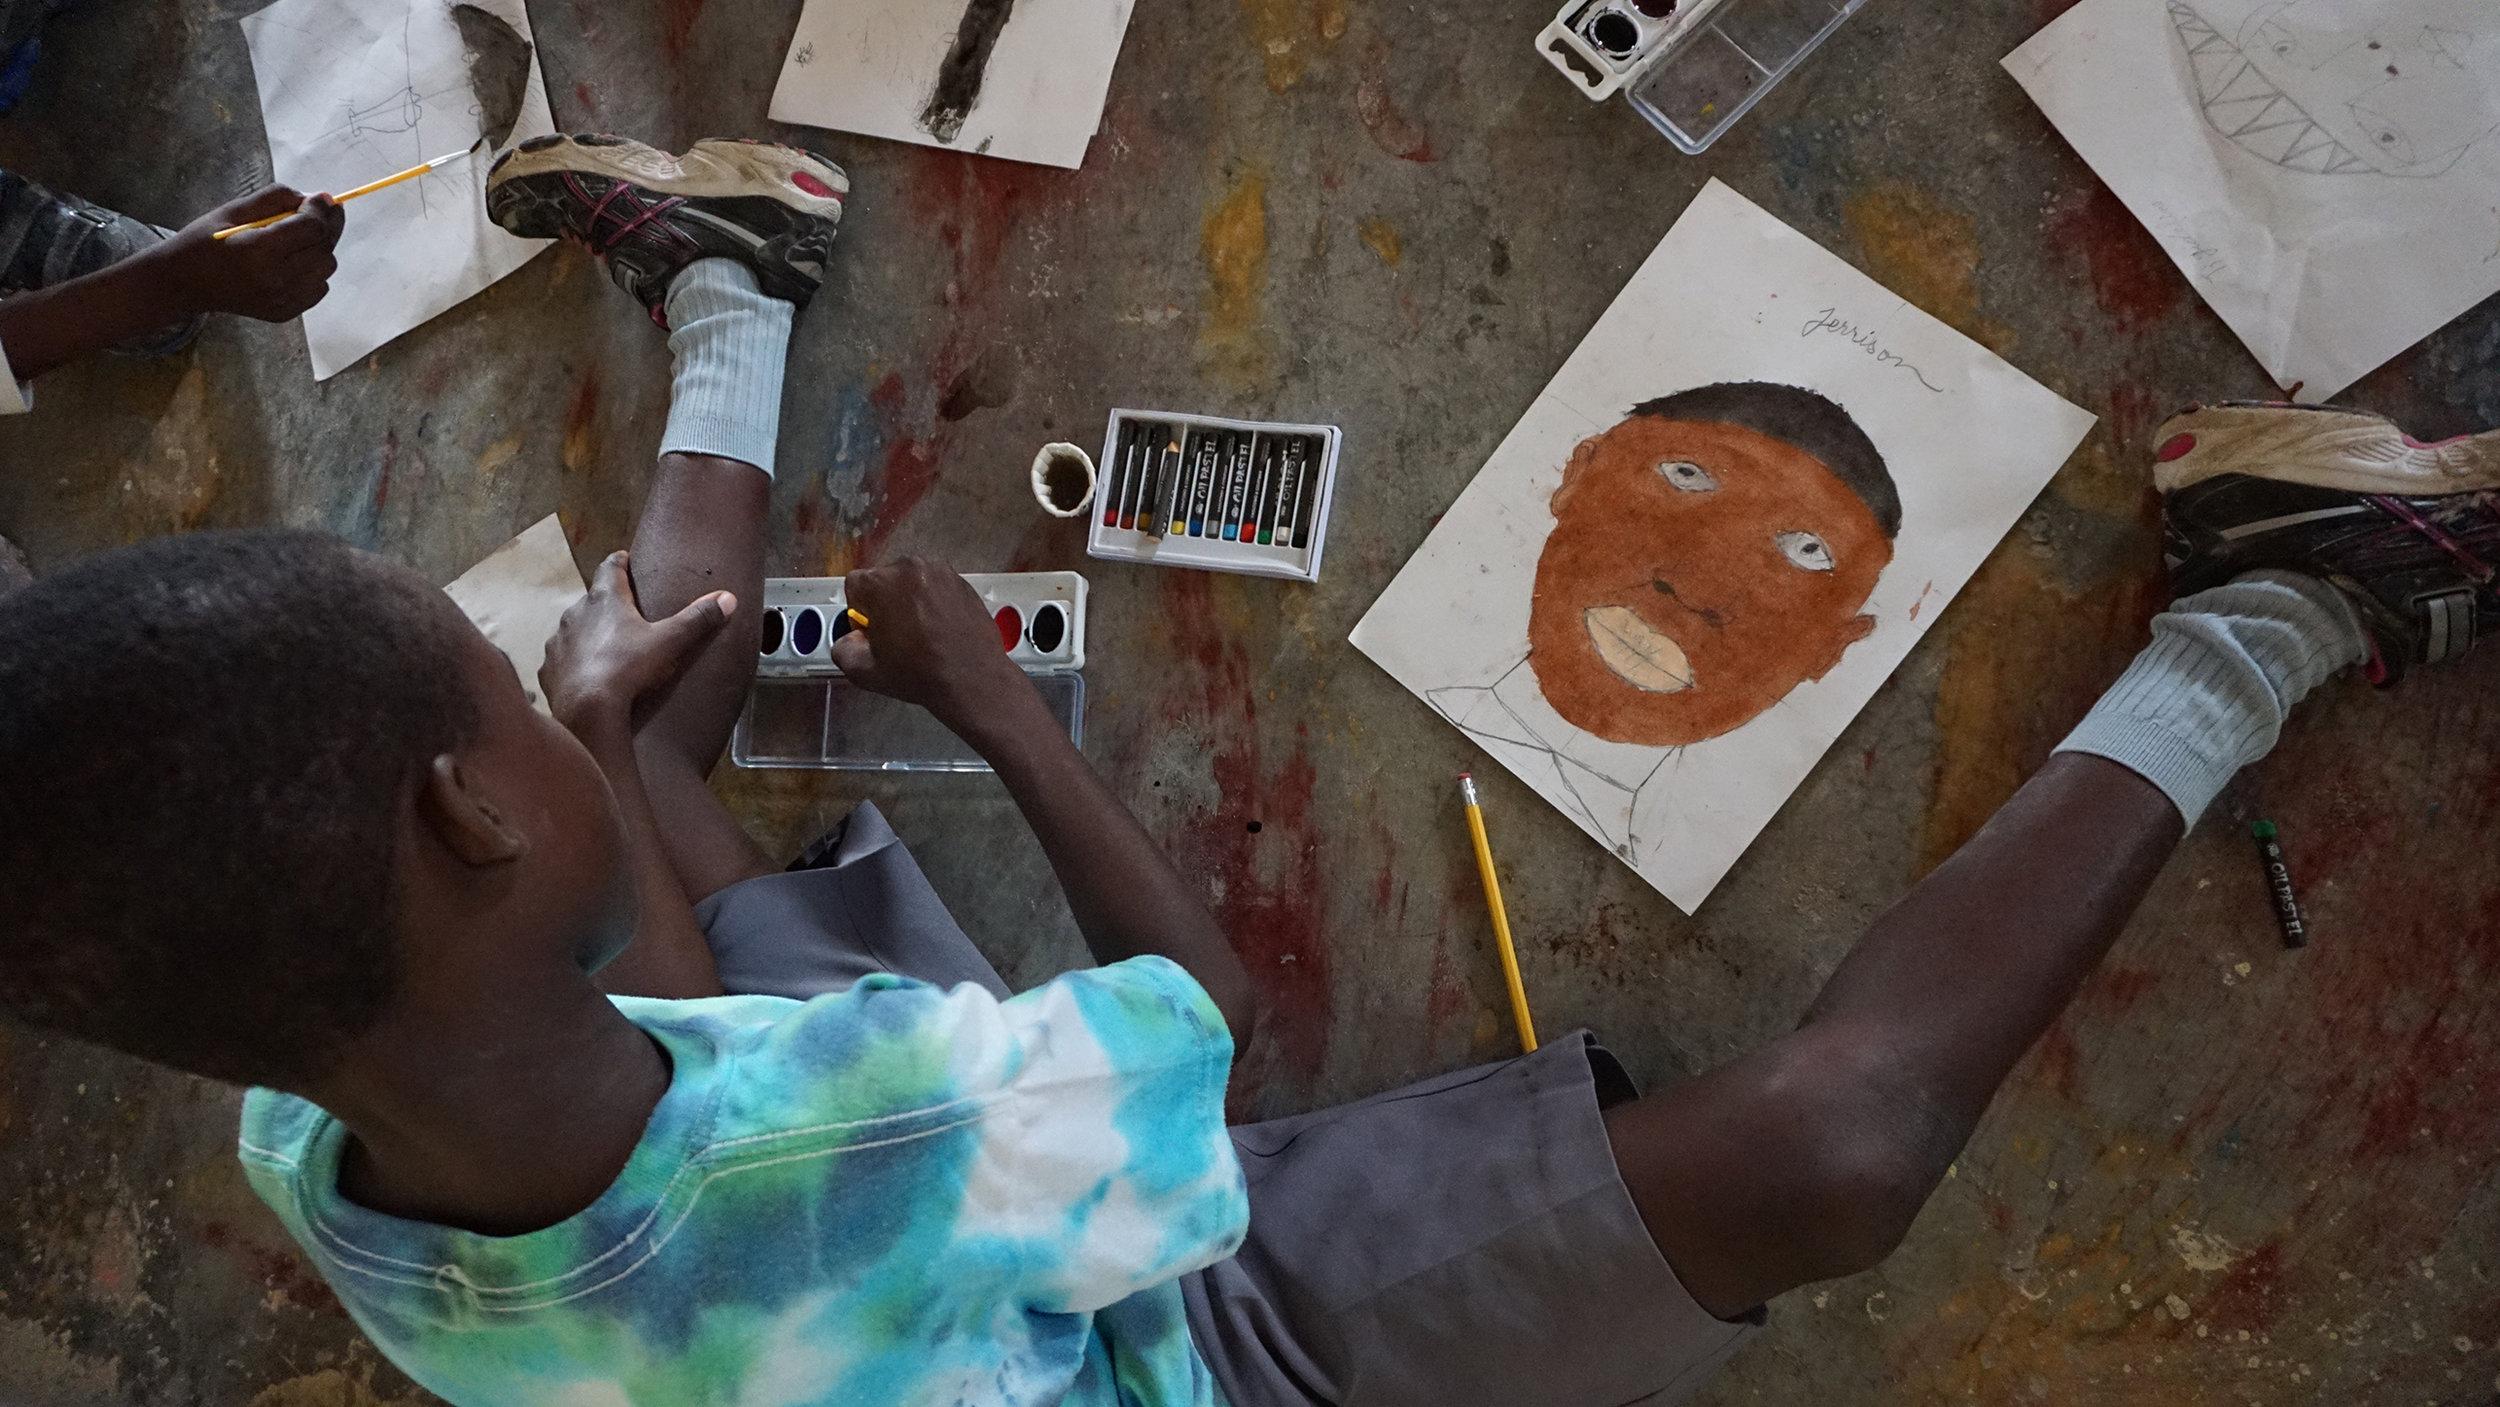 Hague Williams teaching art to children.